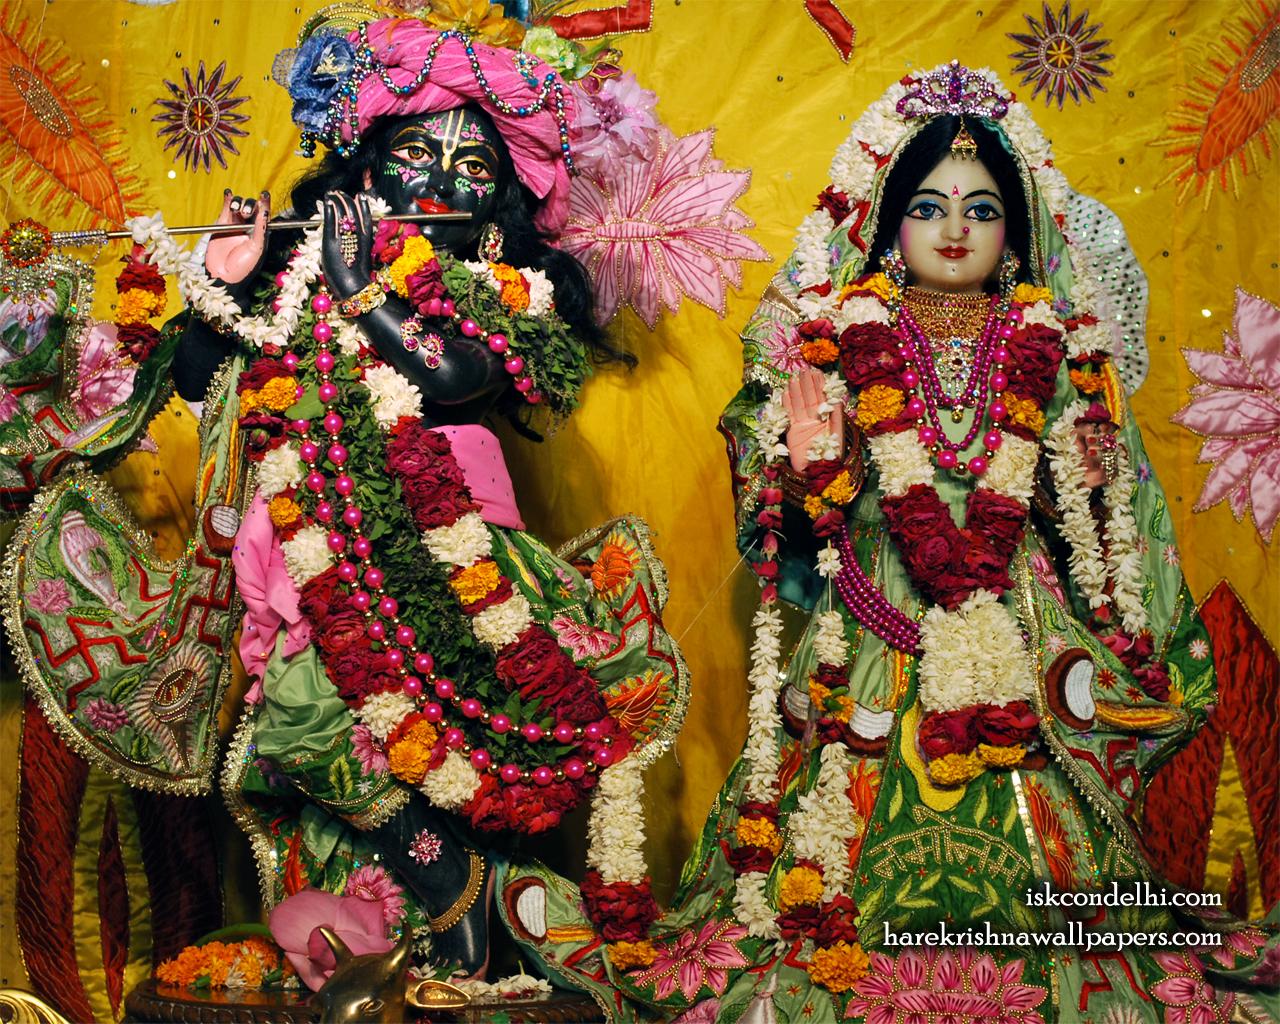 Sri Sri Radha Parthasarathi Wallpaper (003) Size 1280x1024 Download